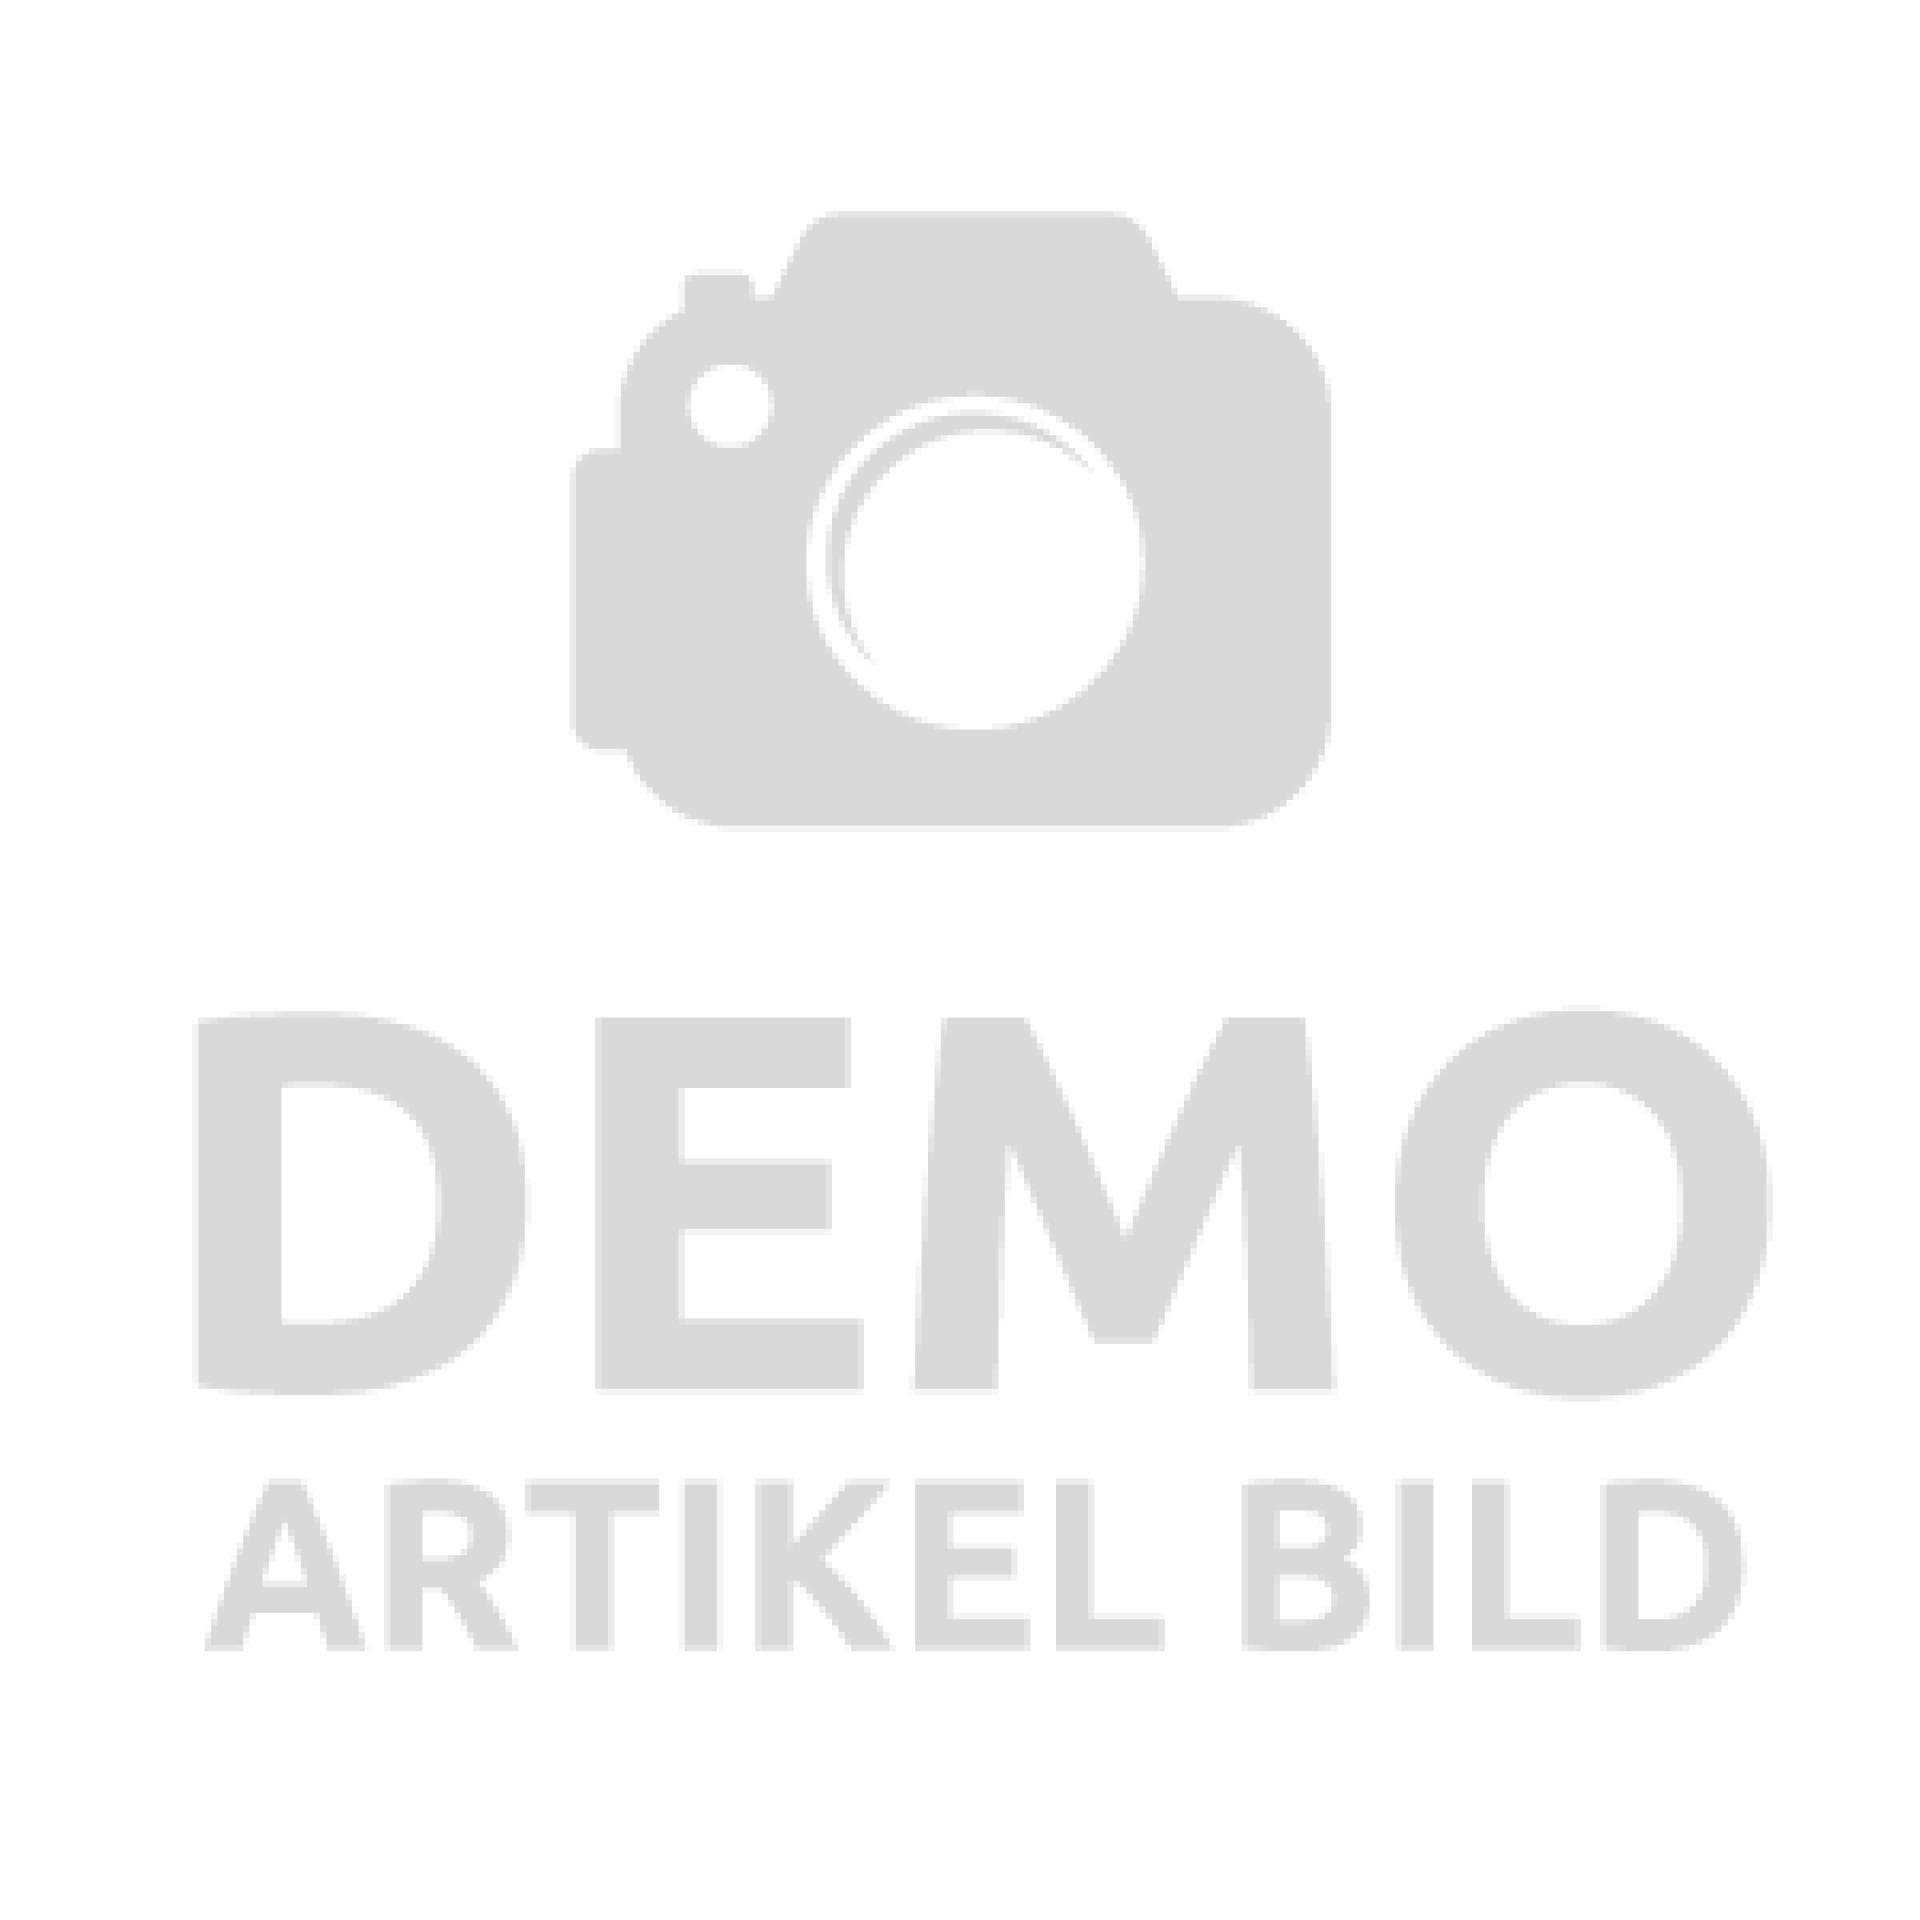 Promotion1 Bild Alt Tag